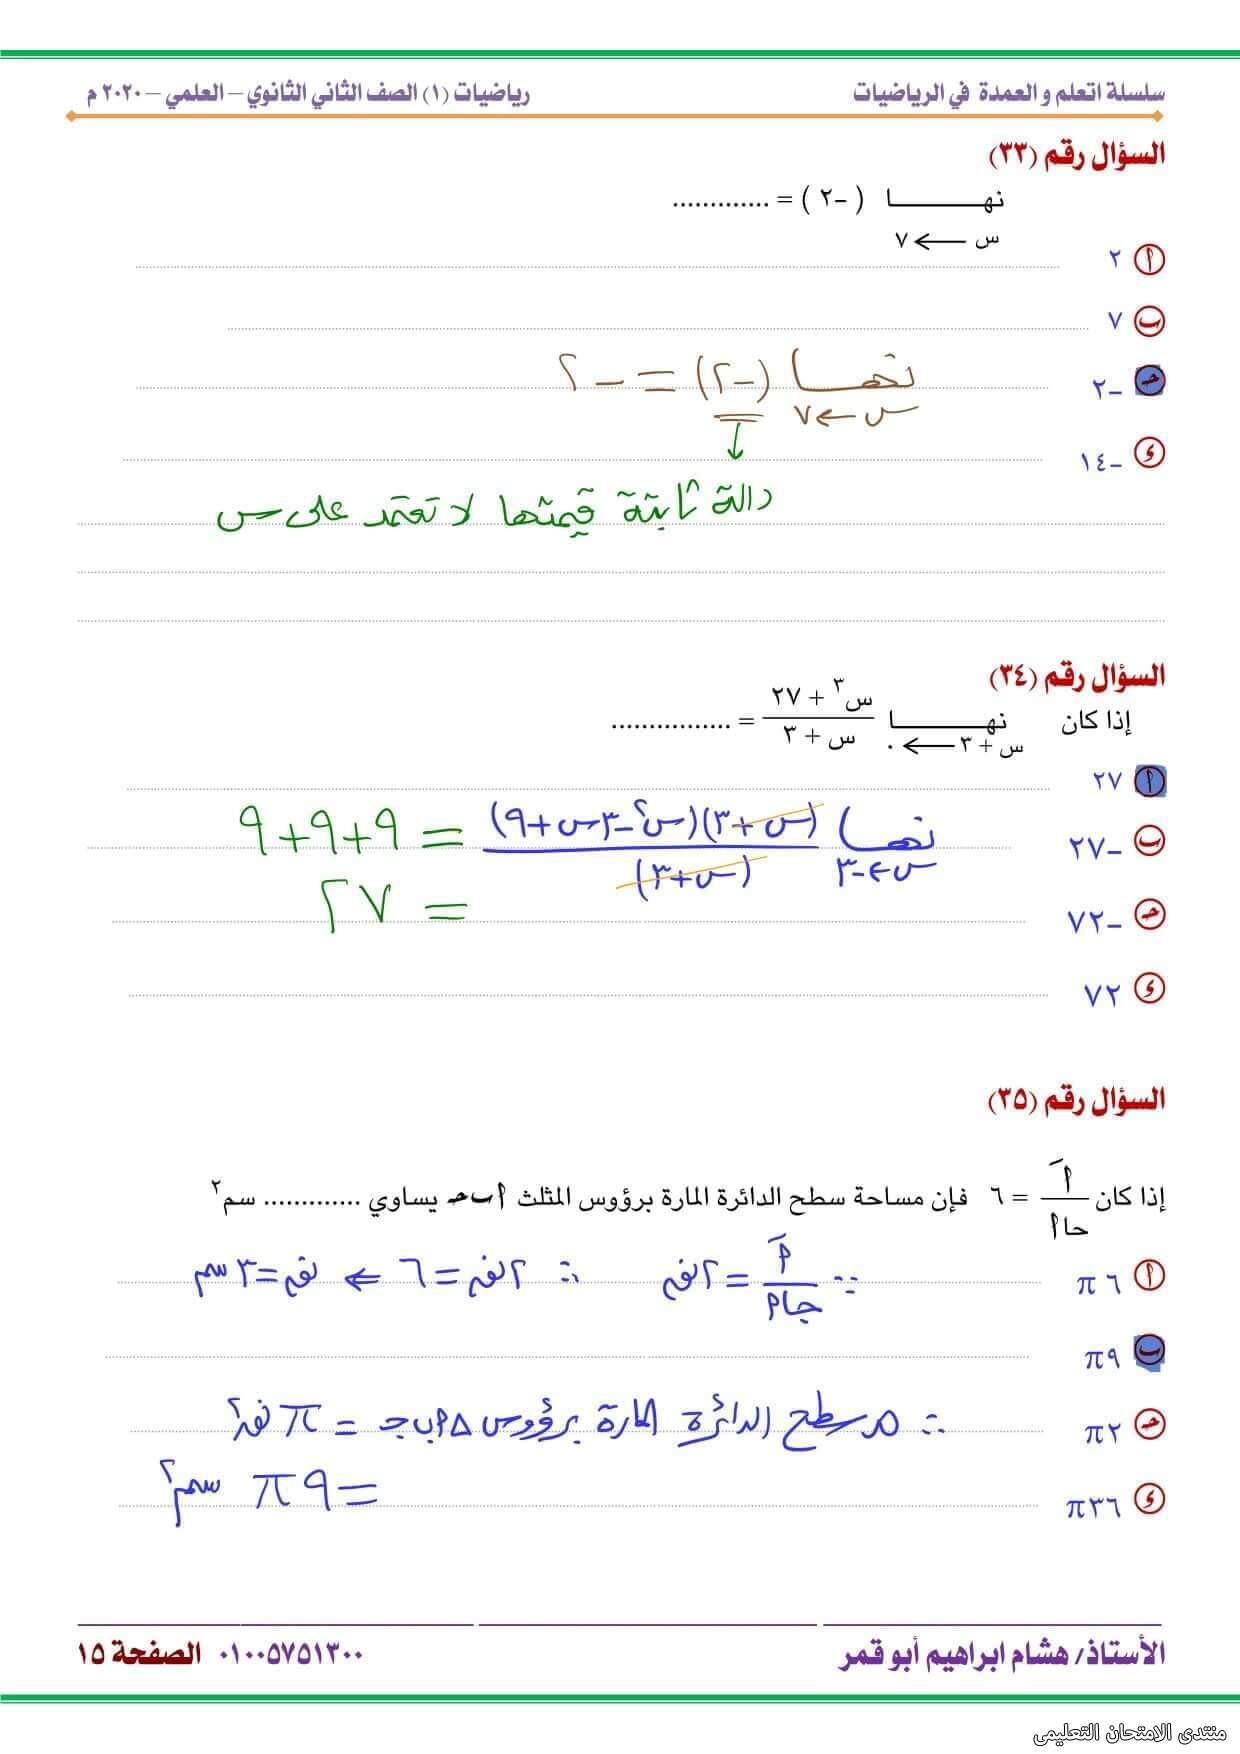 exam-eg.com_16144409500514.jpg